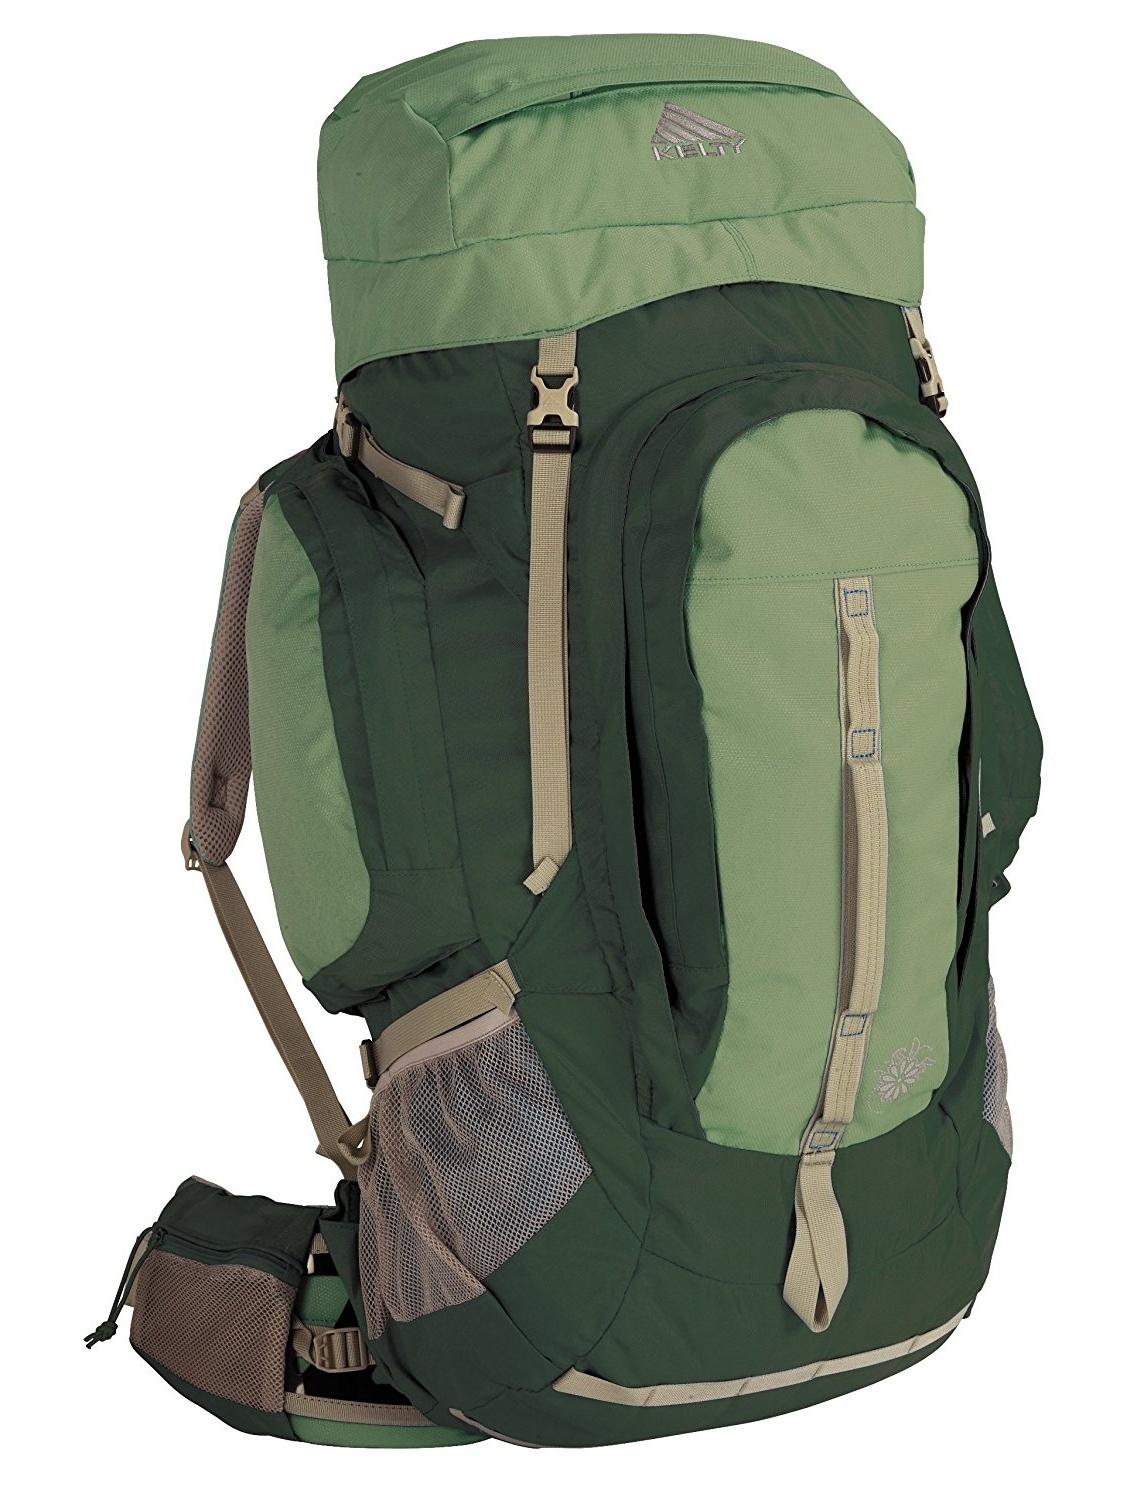 Kelty Women's Coyote 75 Internal Frame Backpack by Kelty